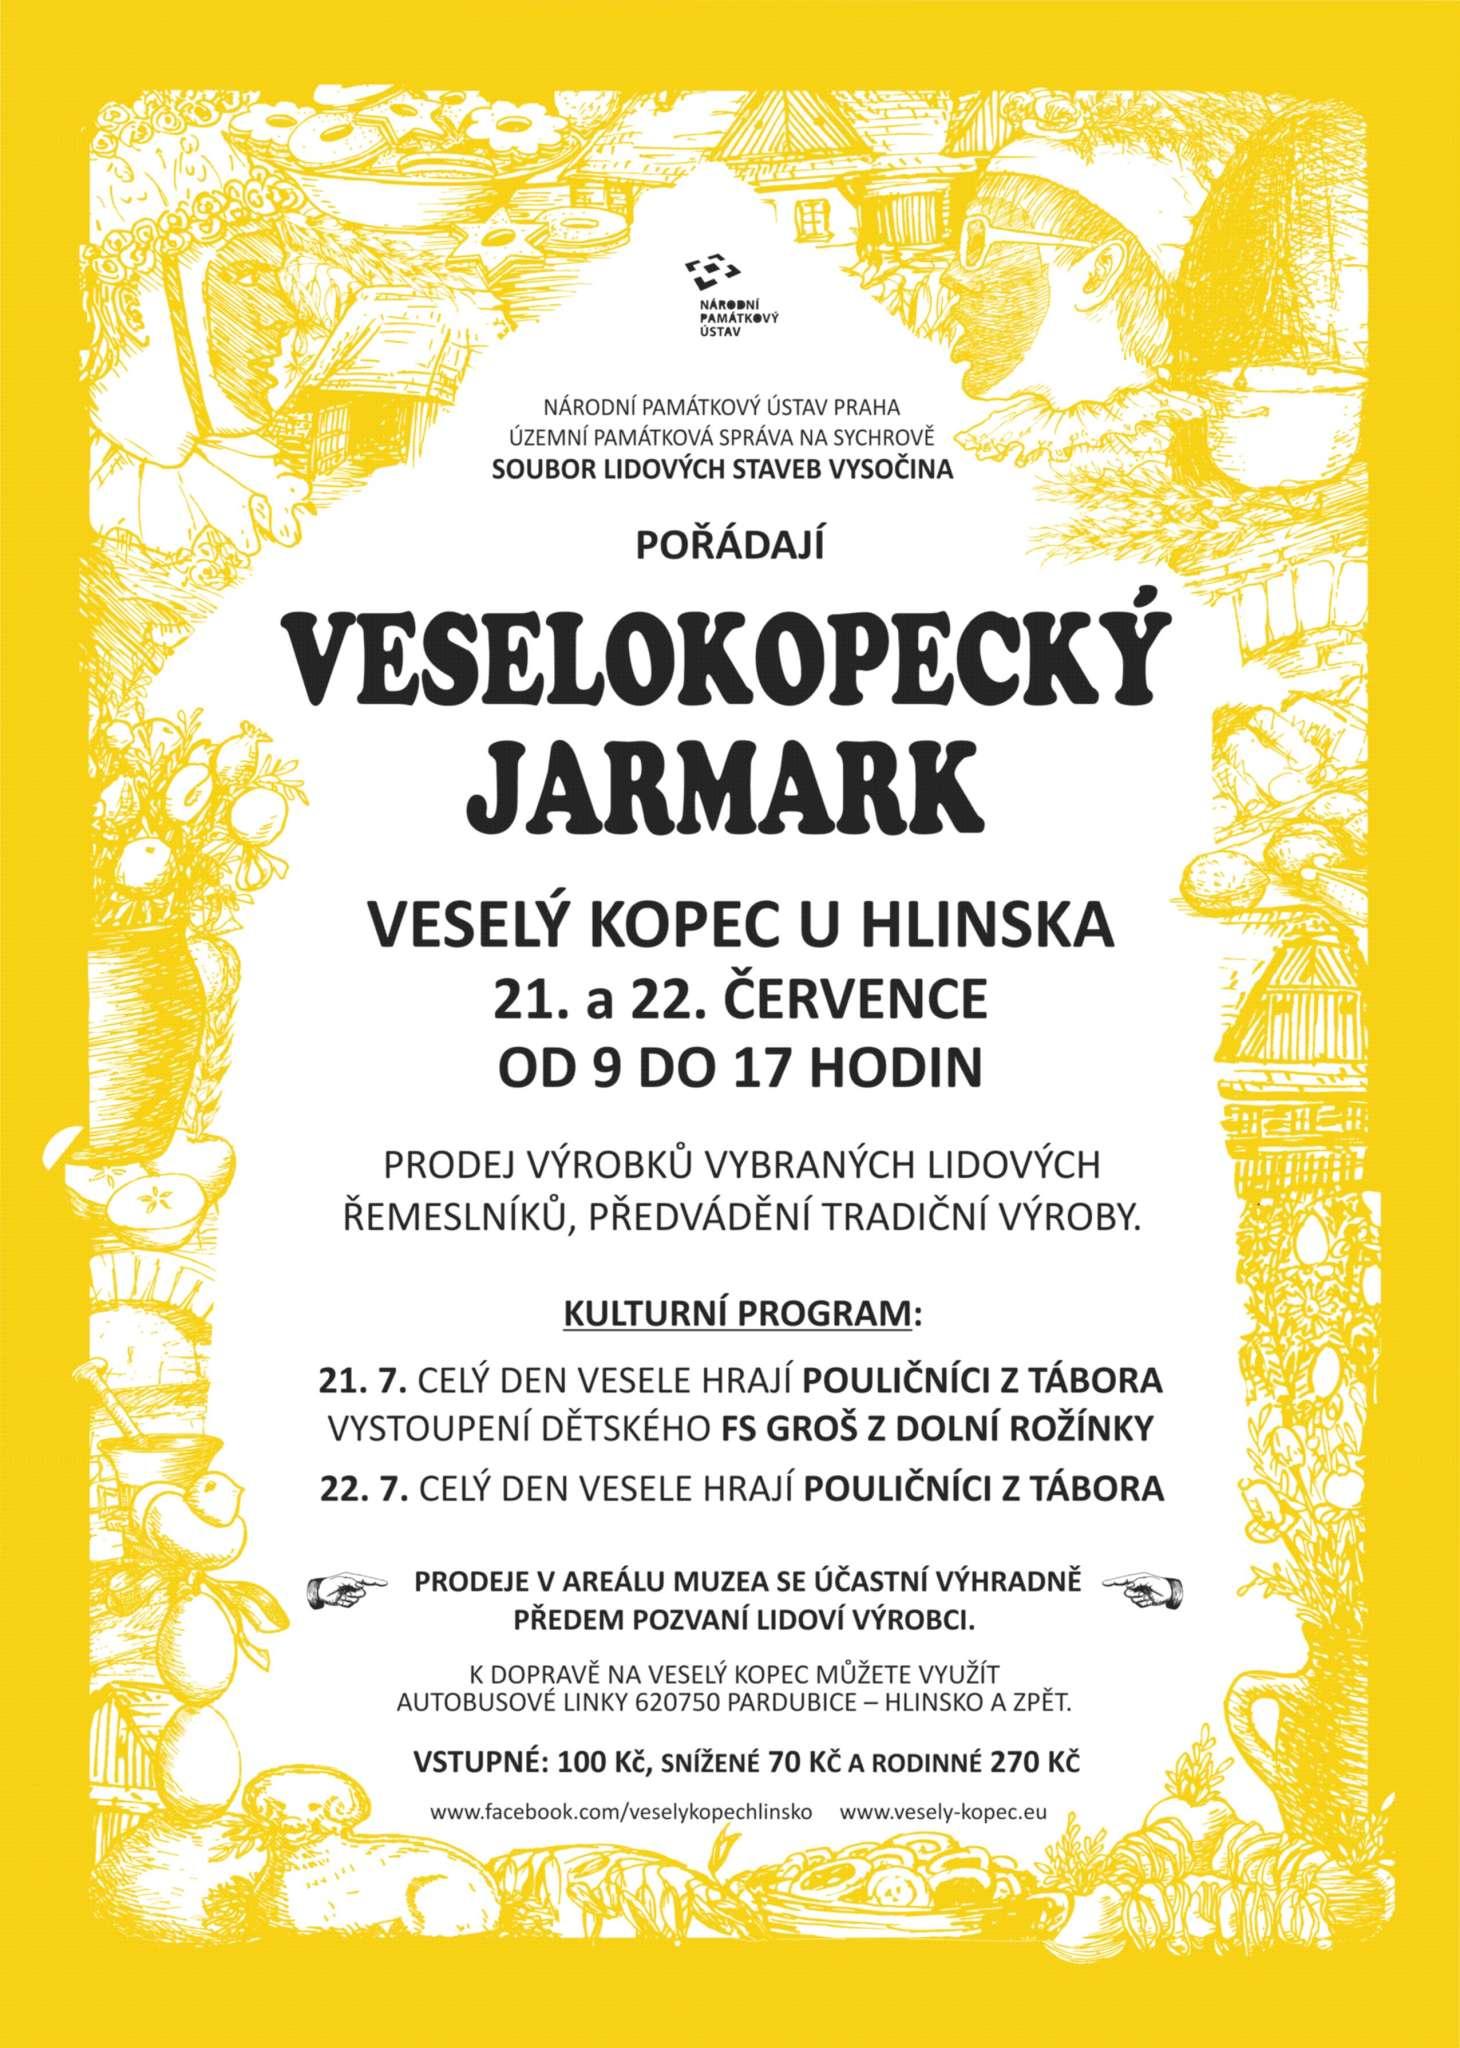 veselokopecky-jarmark-hlinsko-2018-2048